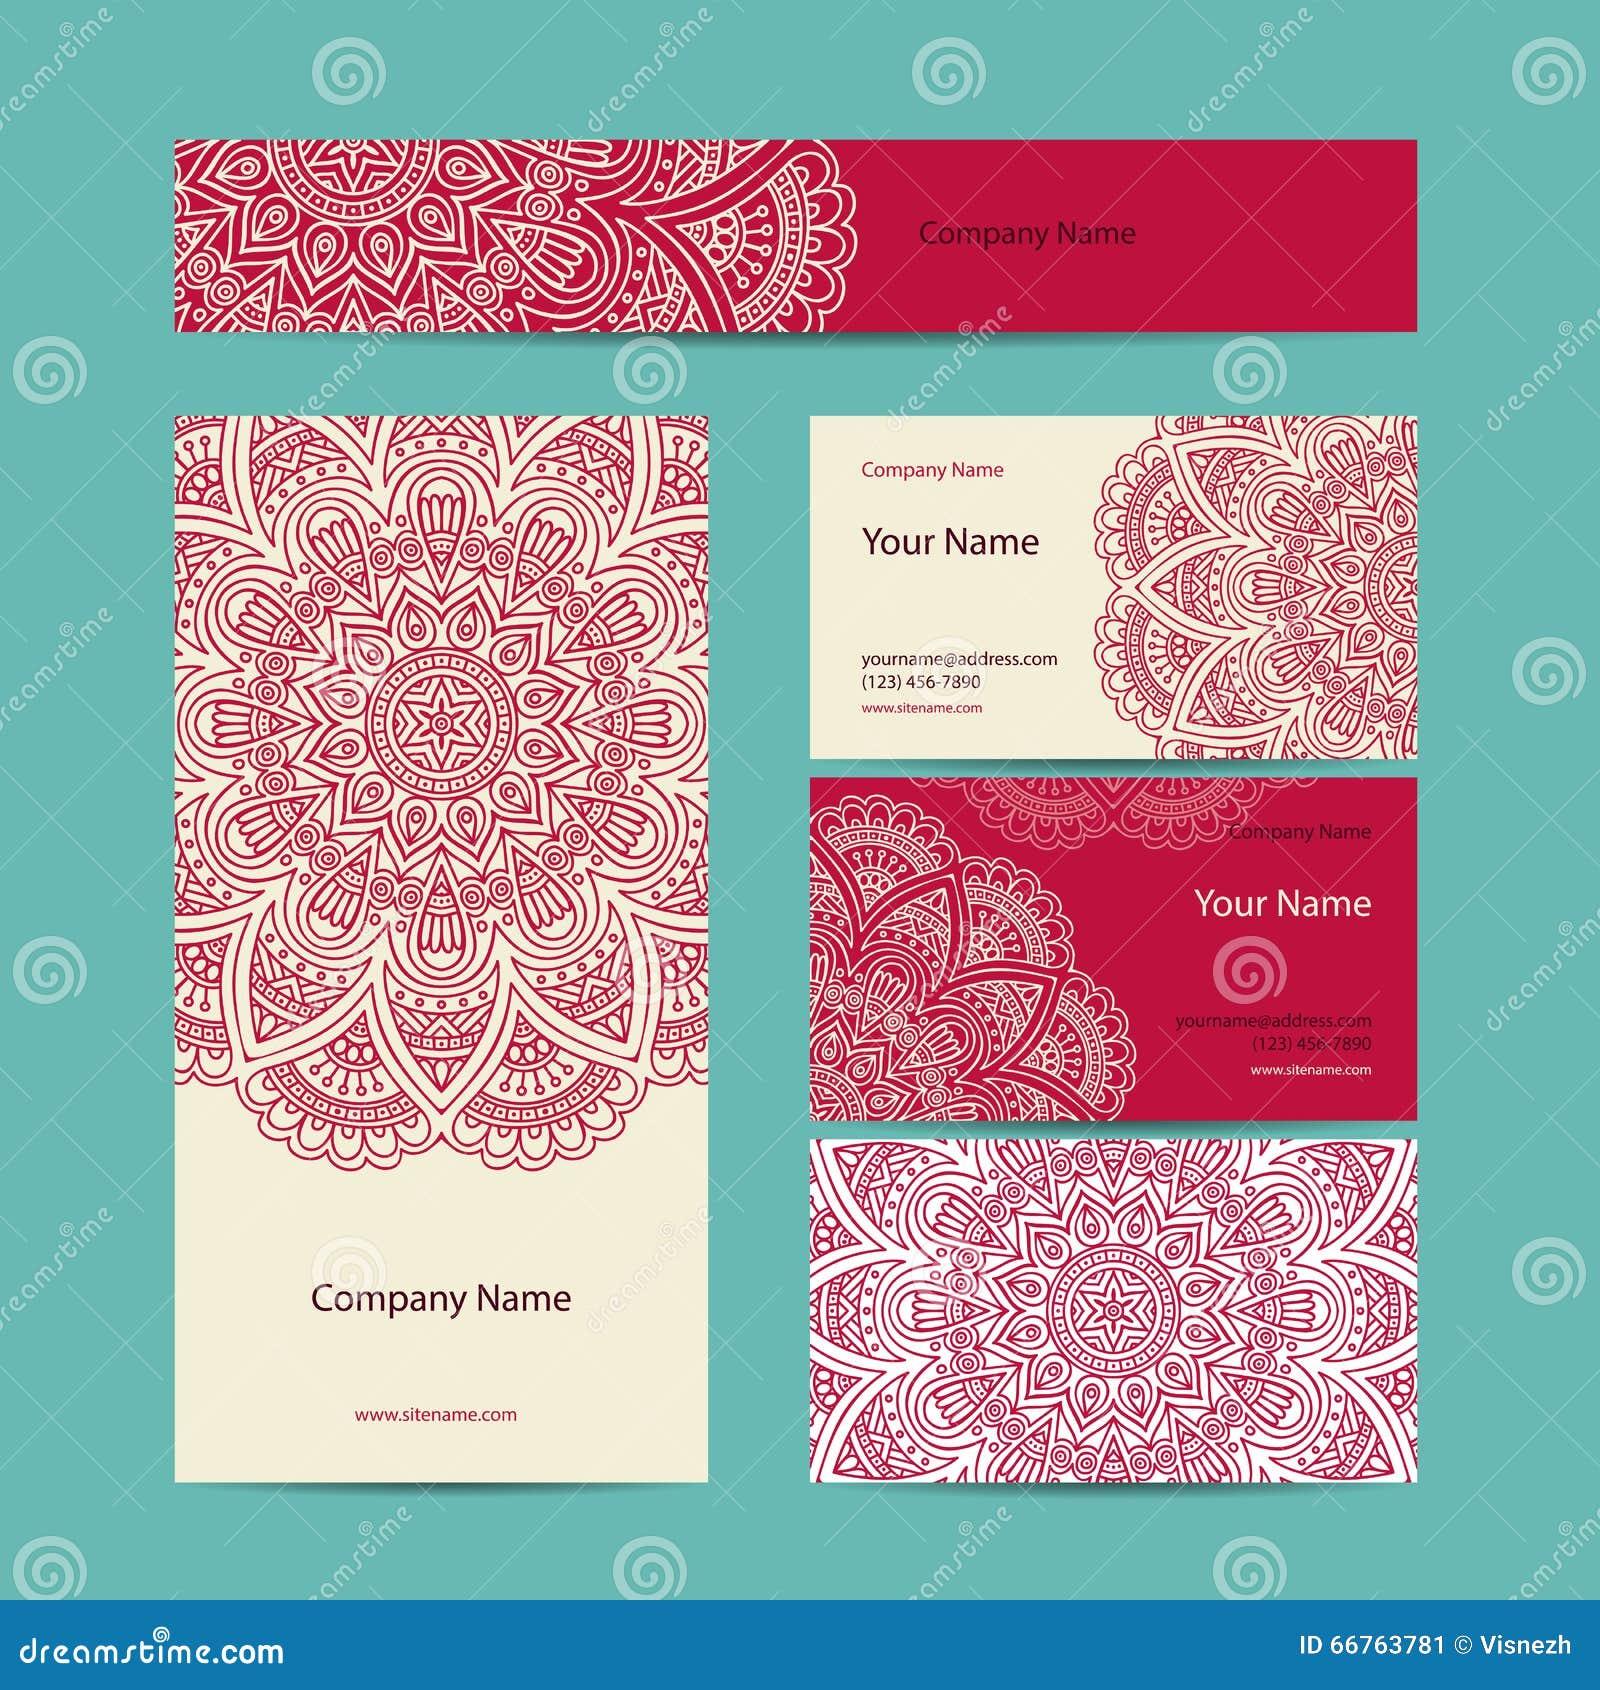 Business Card Vintage Decorative Elements Stock Vector